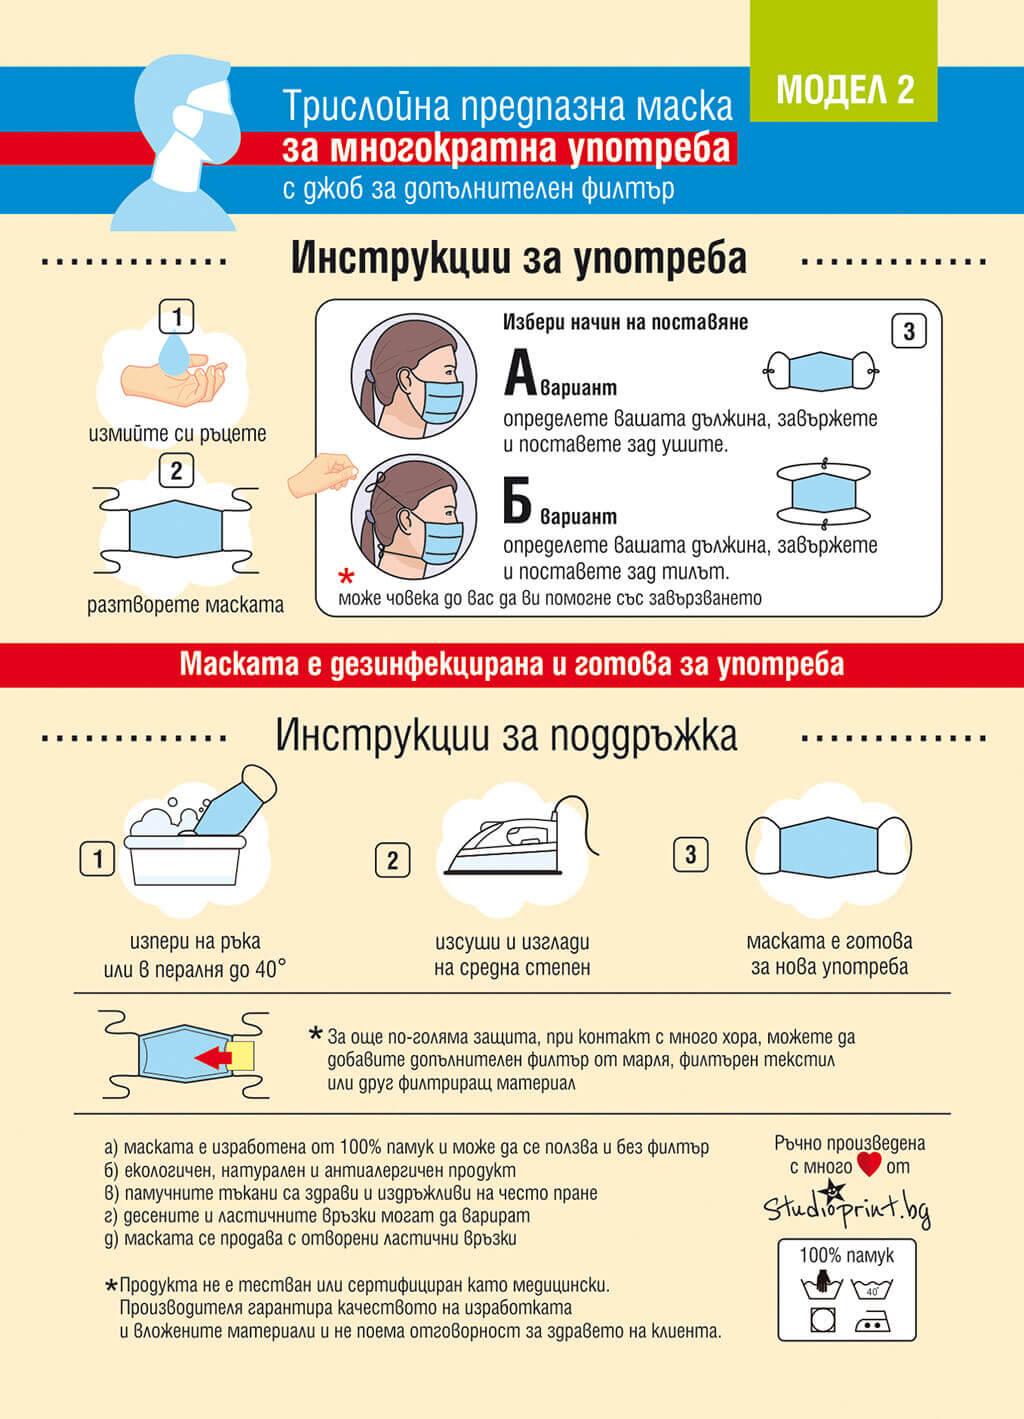 инструкции предпазна маска